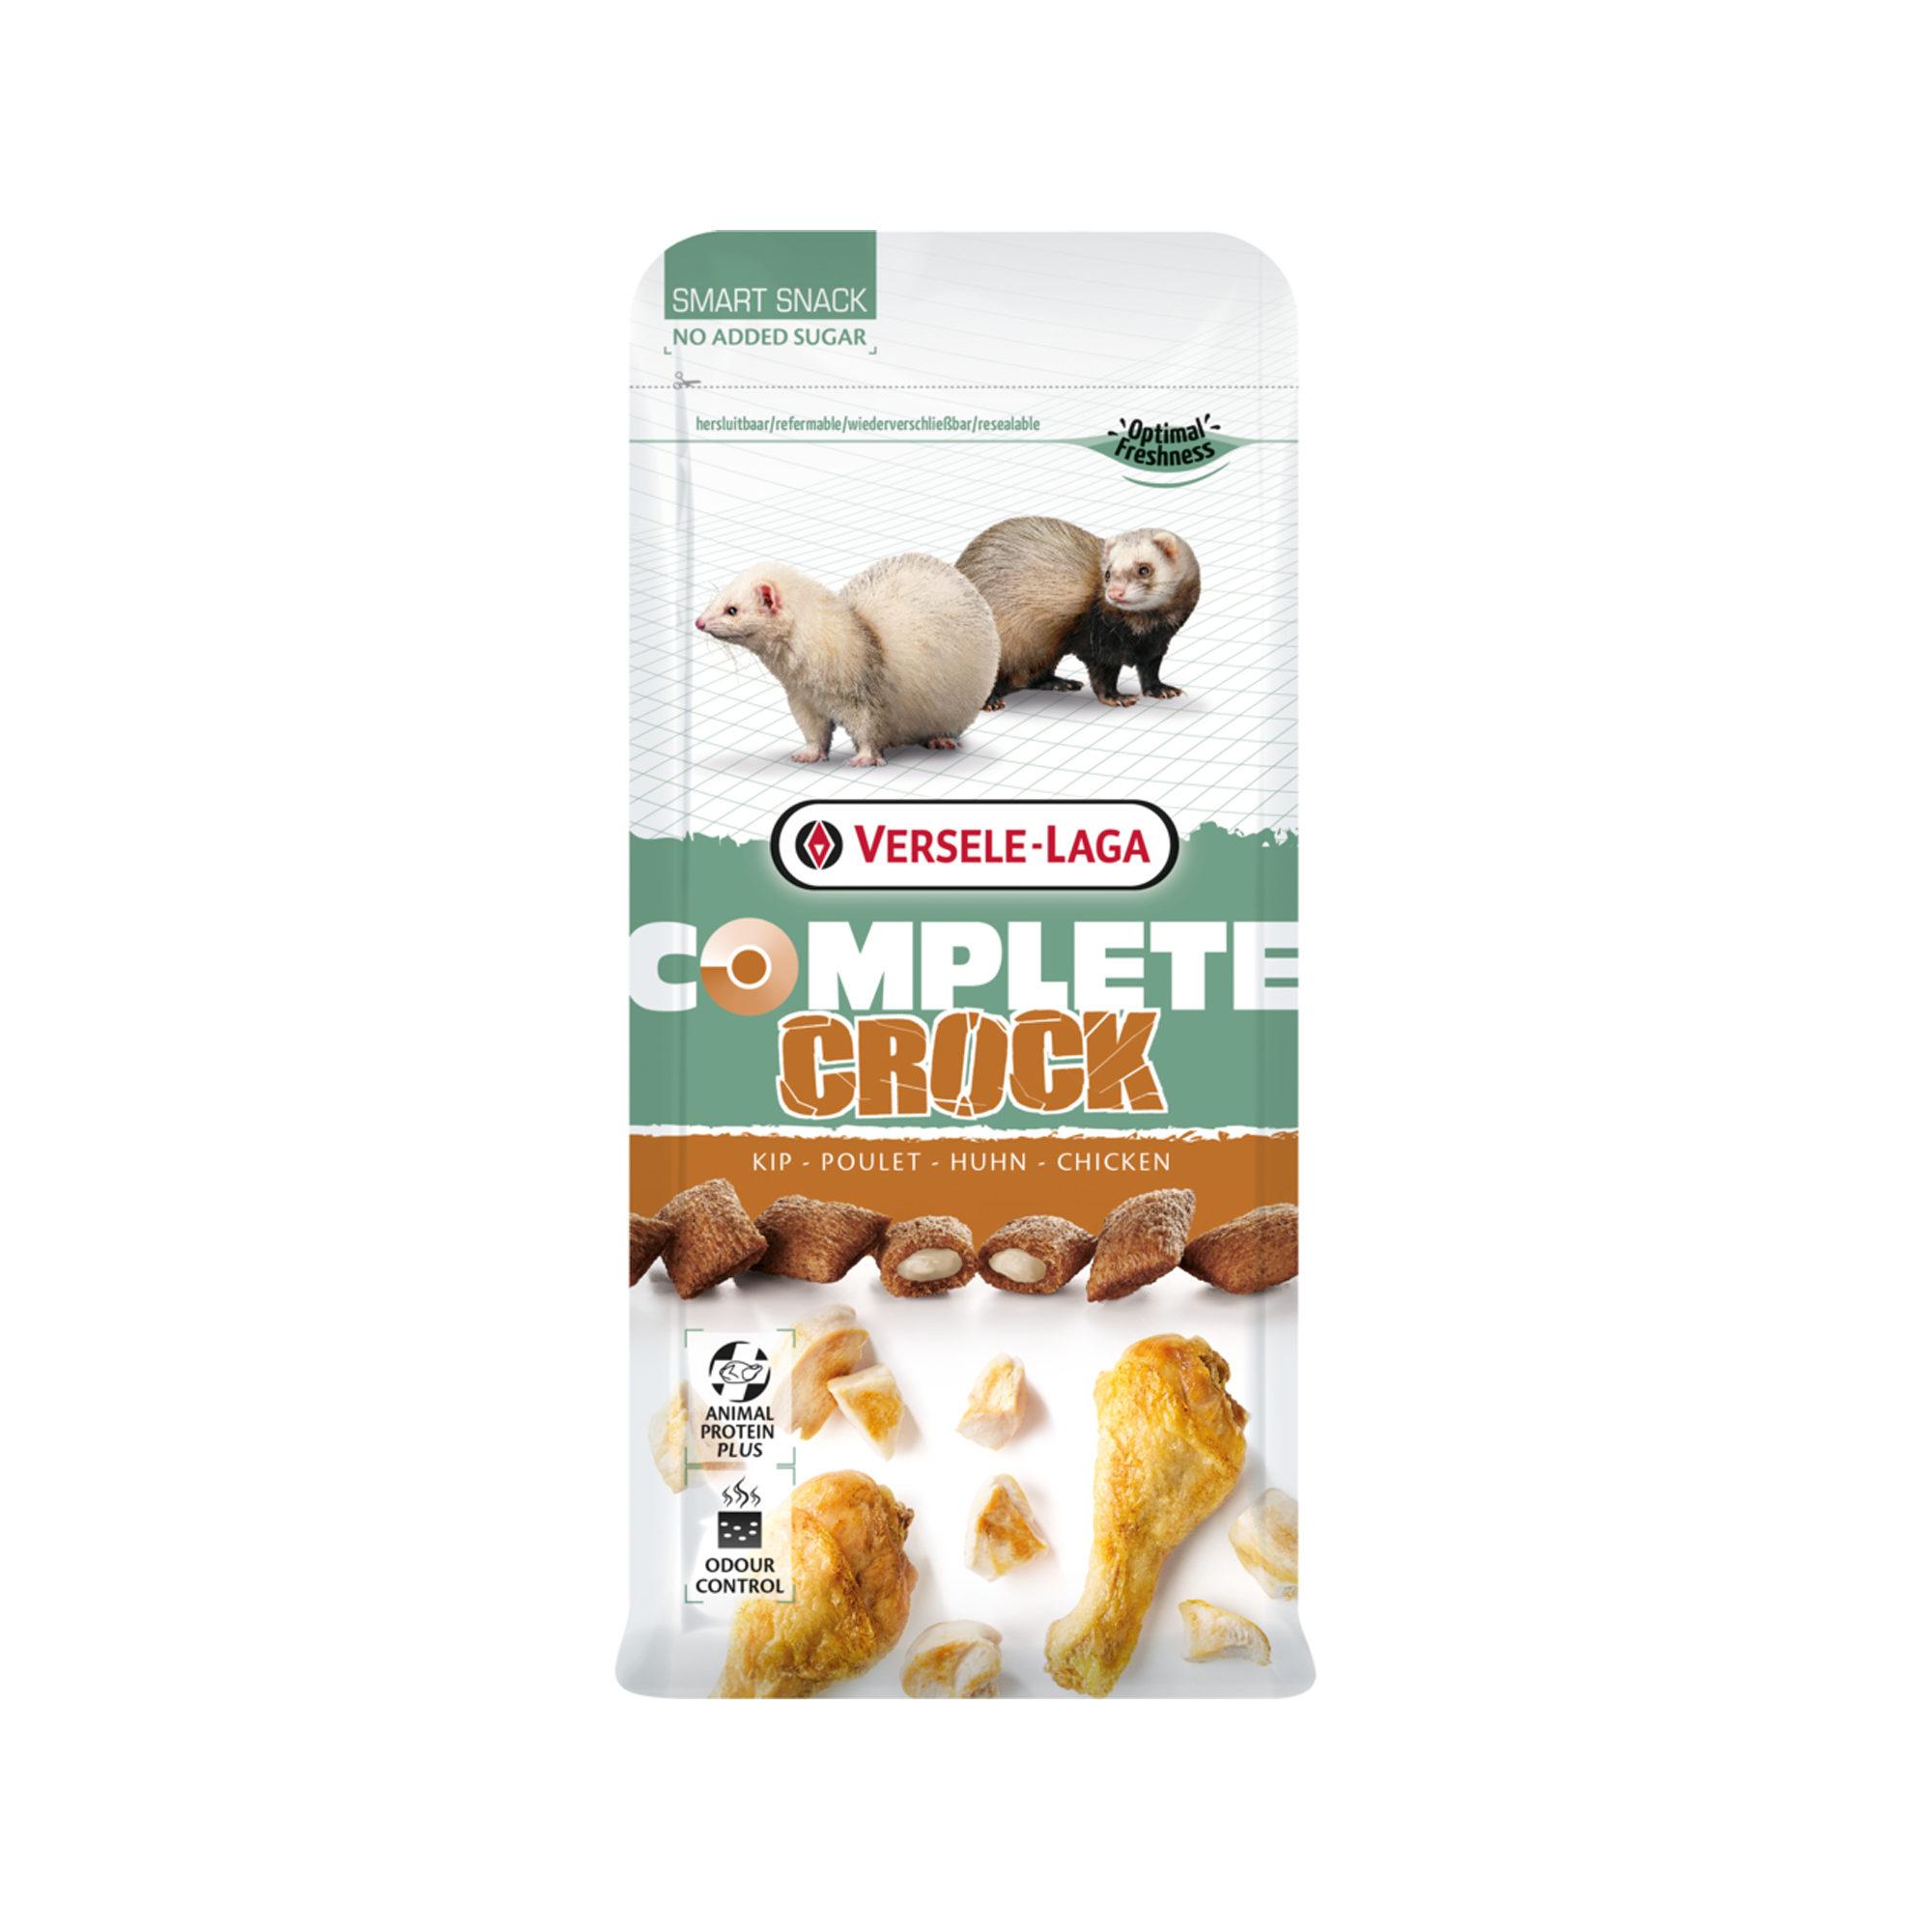 Versele-Laga Complete Crock - Poulet